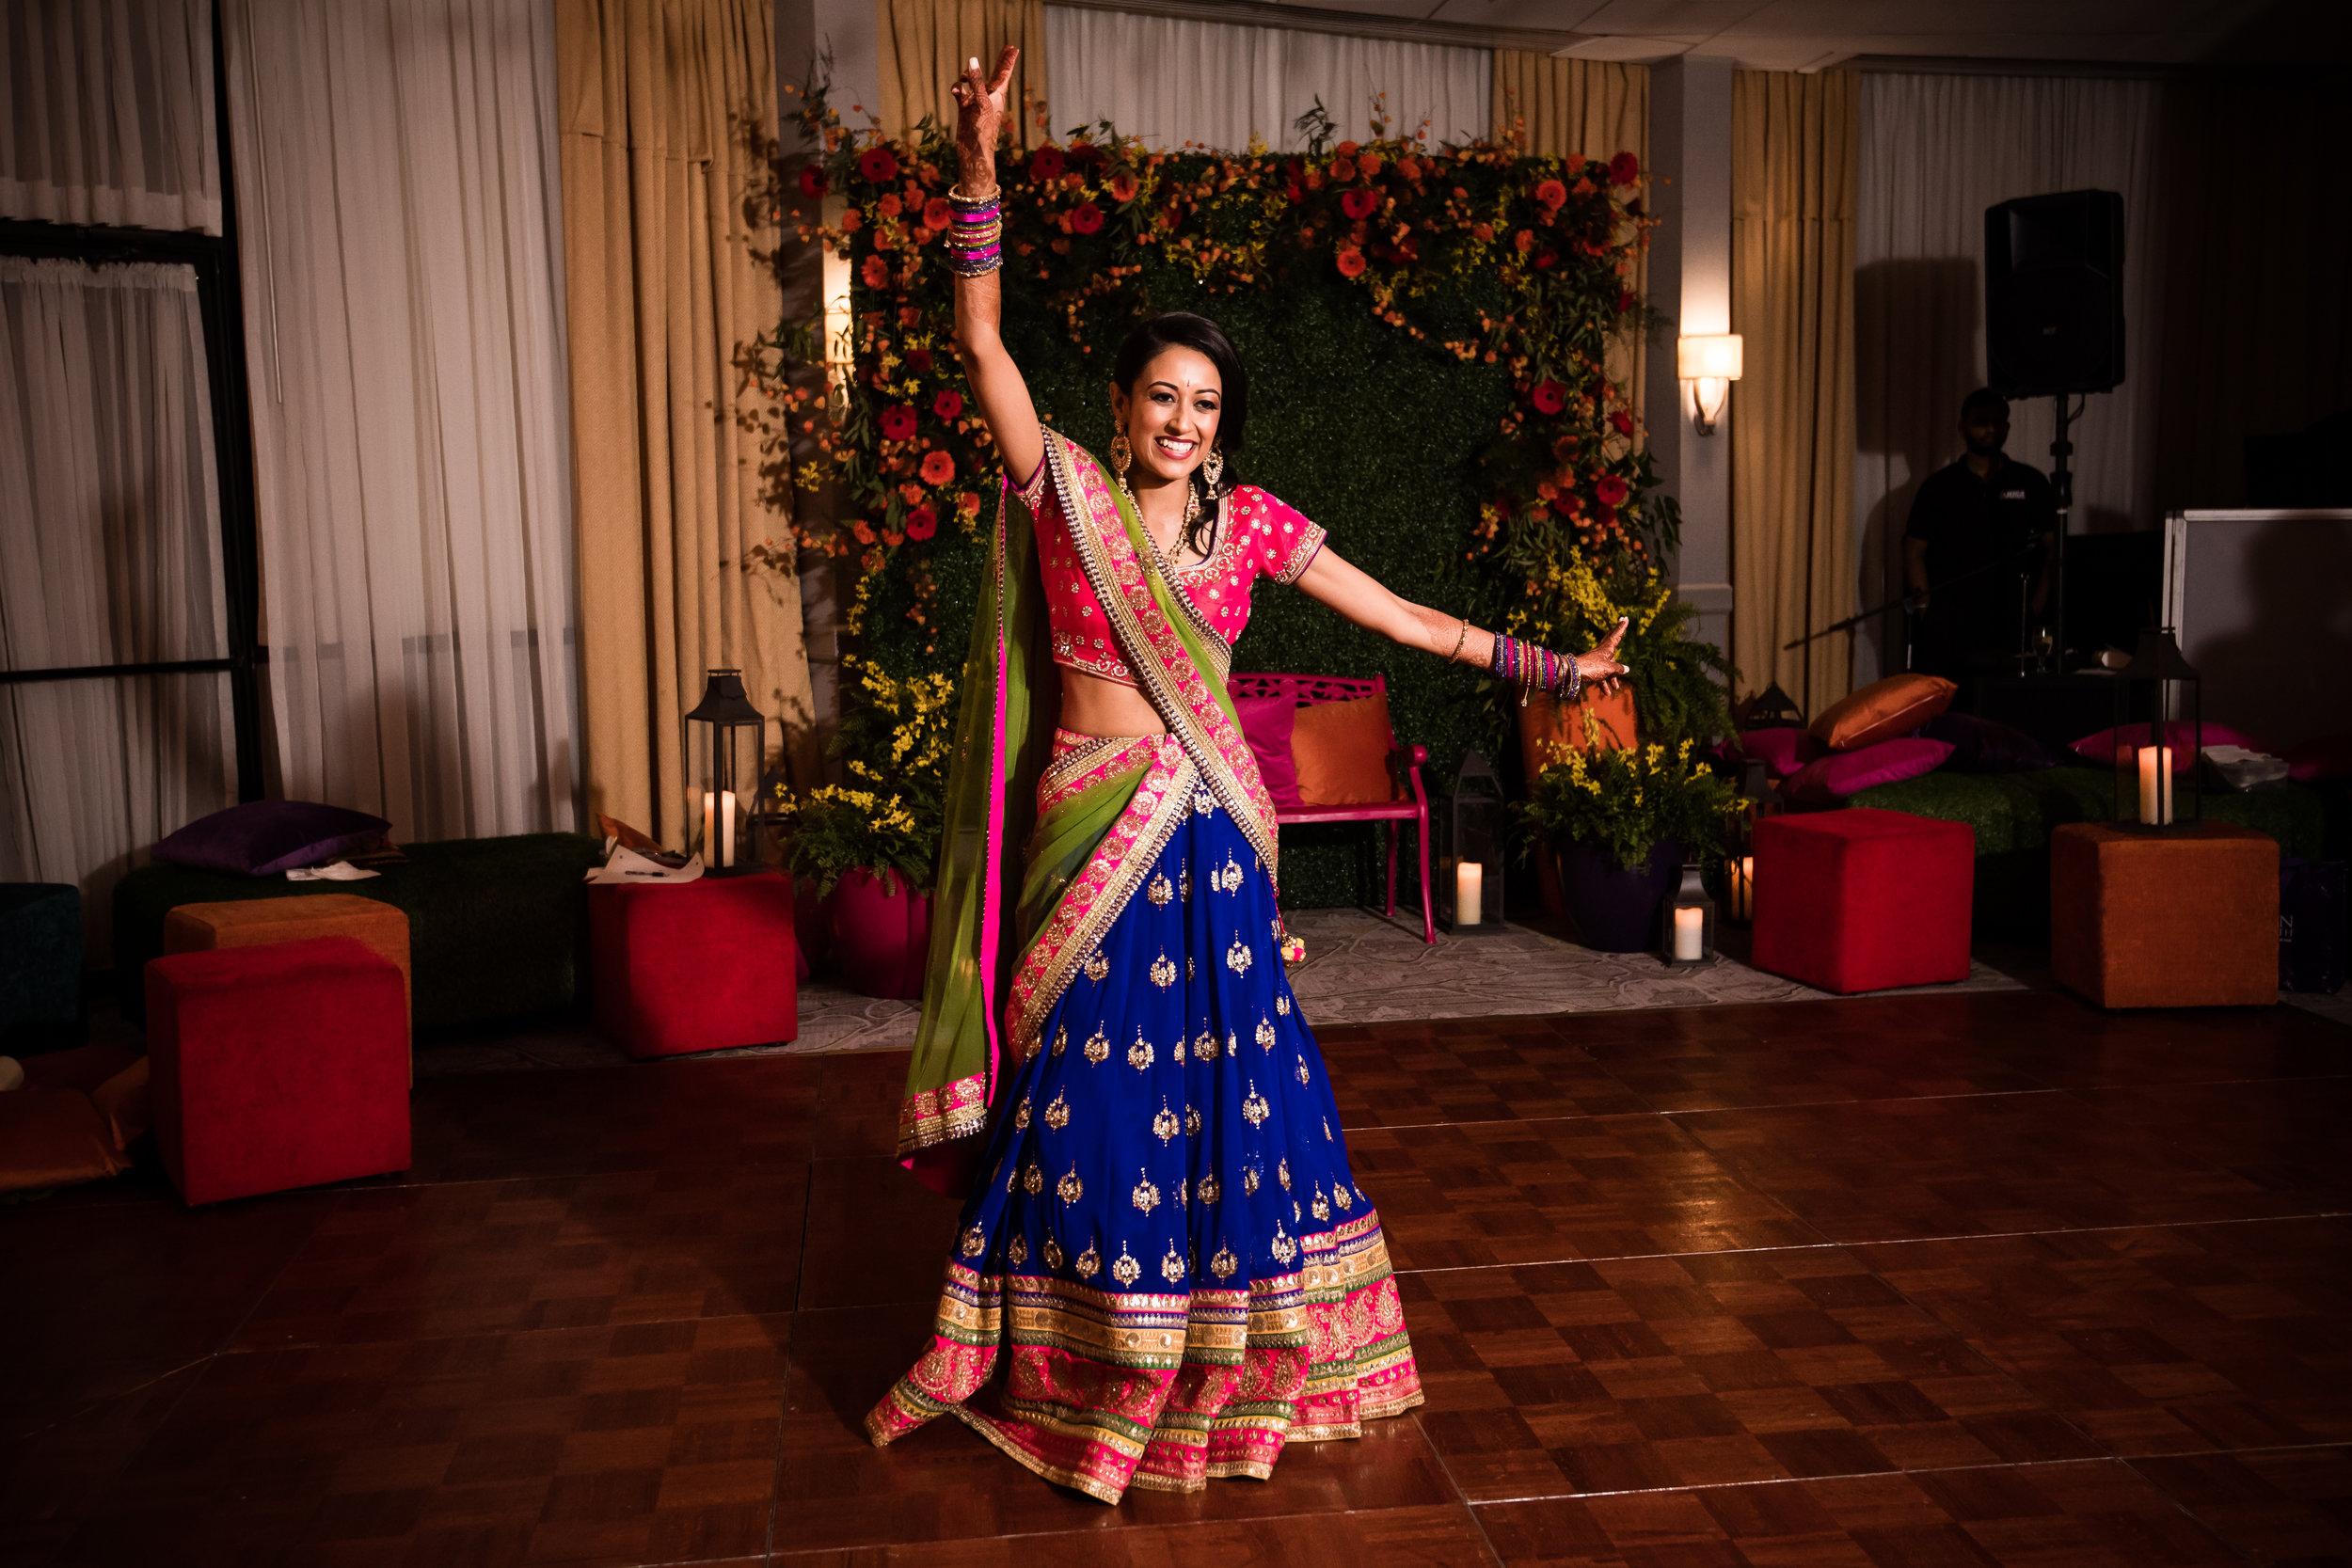 INDIAN WEDDING SANGEET BRIDE DANCING 2.jpg